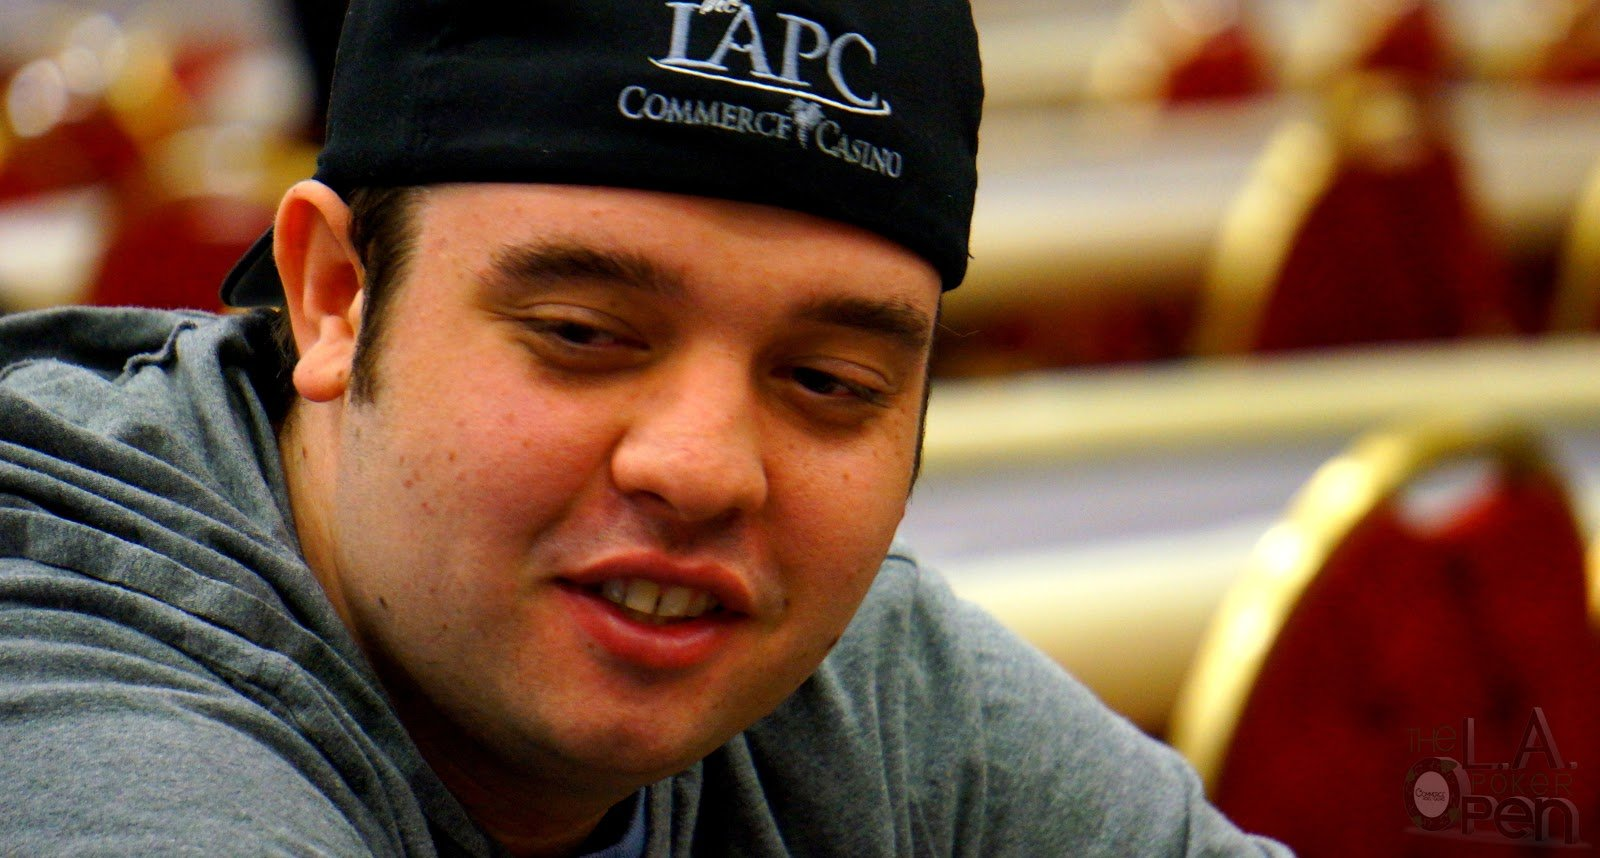 Mike Noori Matt Savage McDonald's Bet